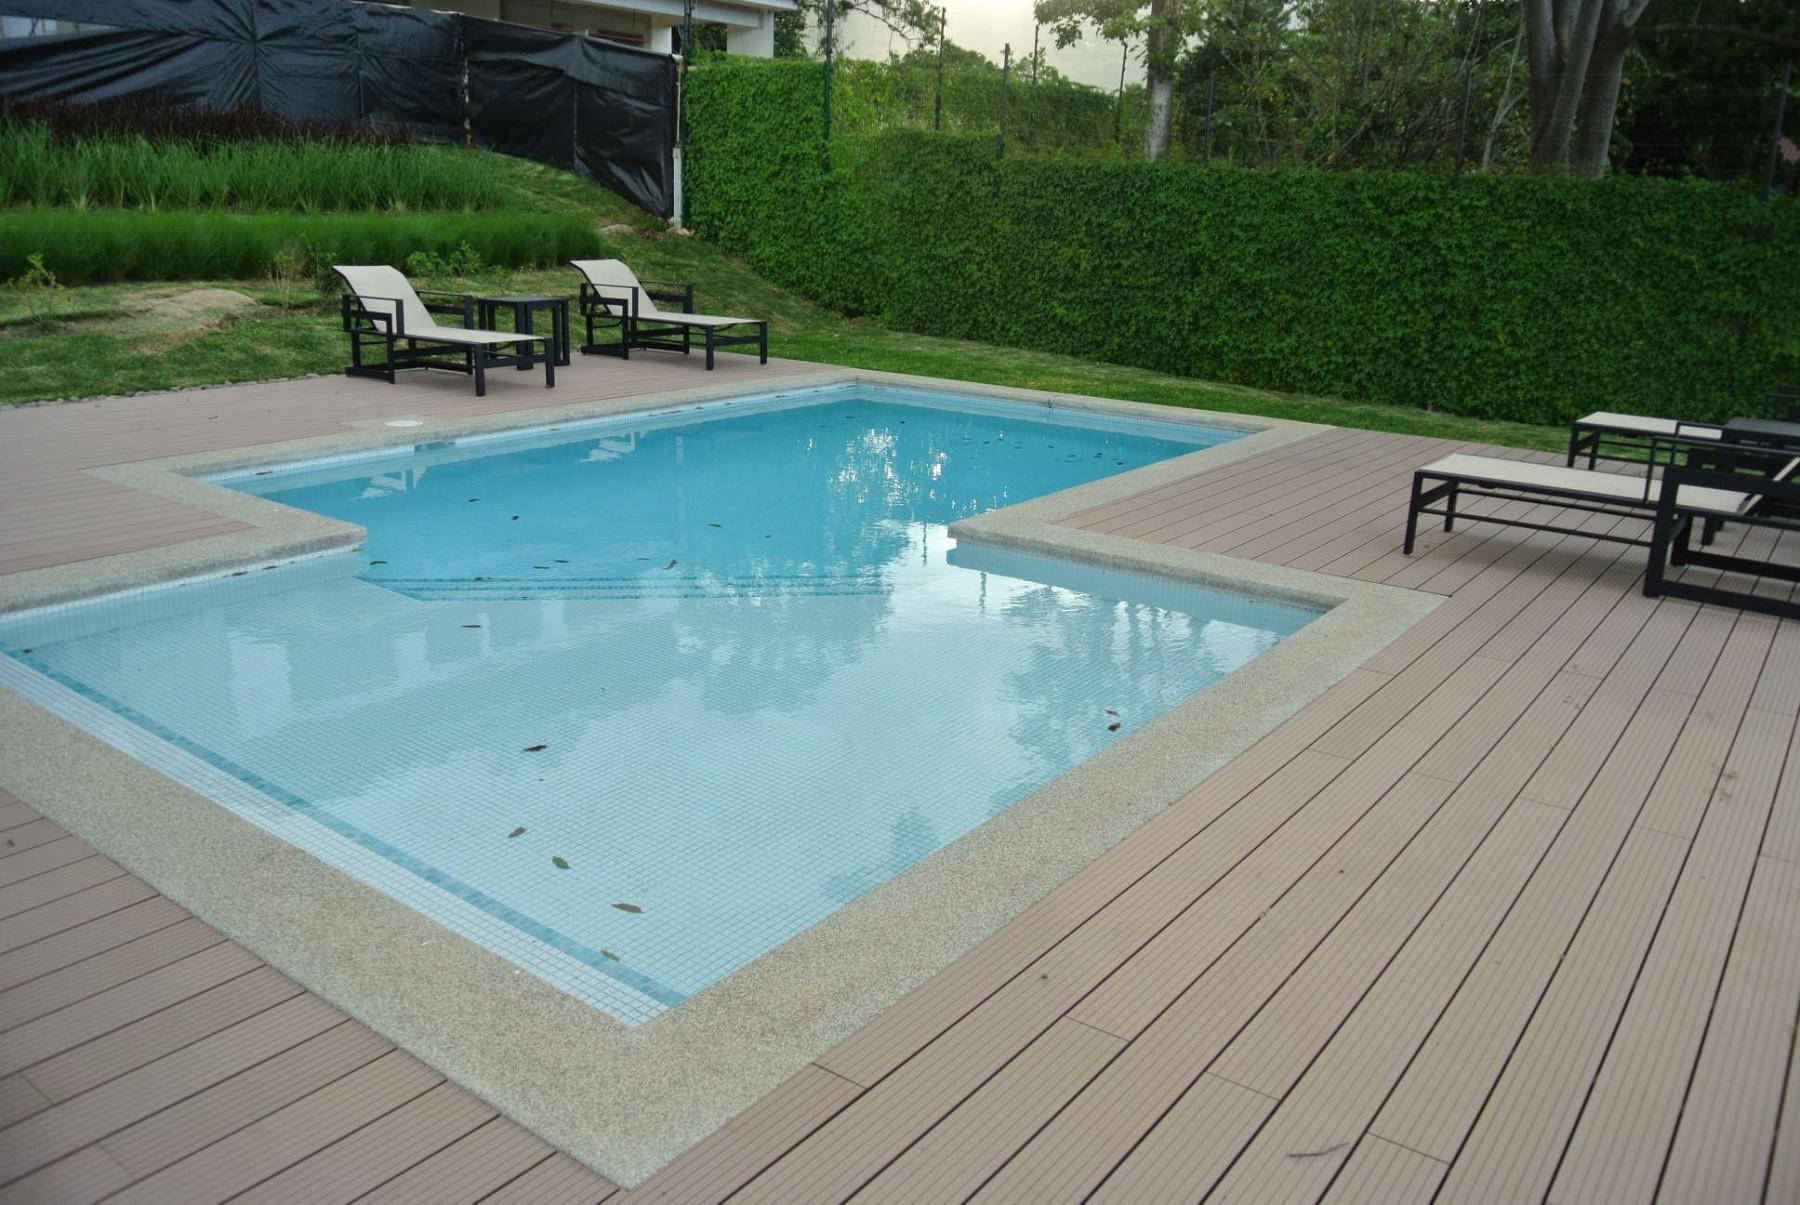 Pool construction in Escazu Costa Rica